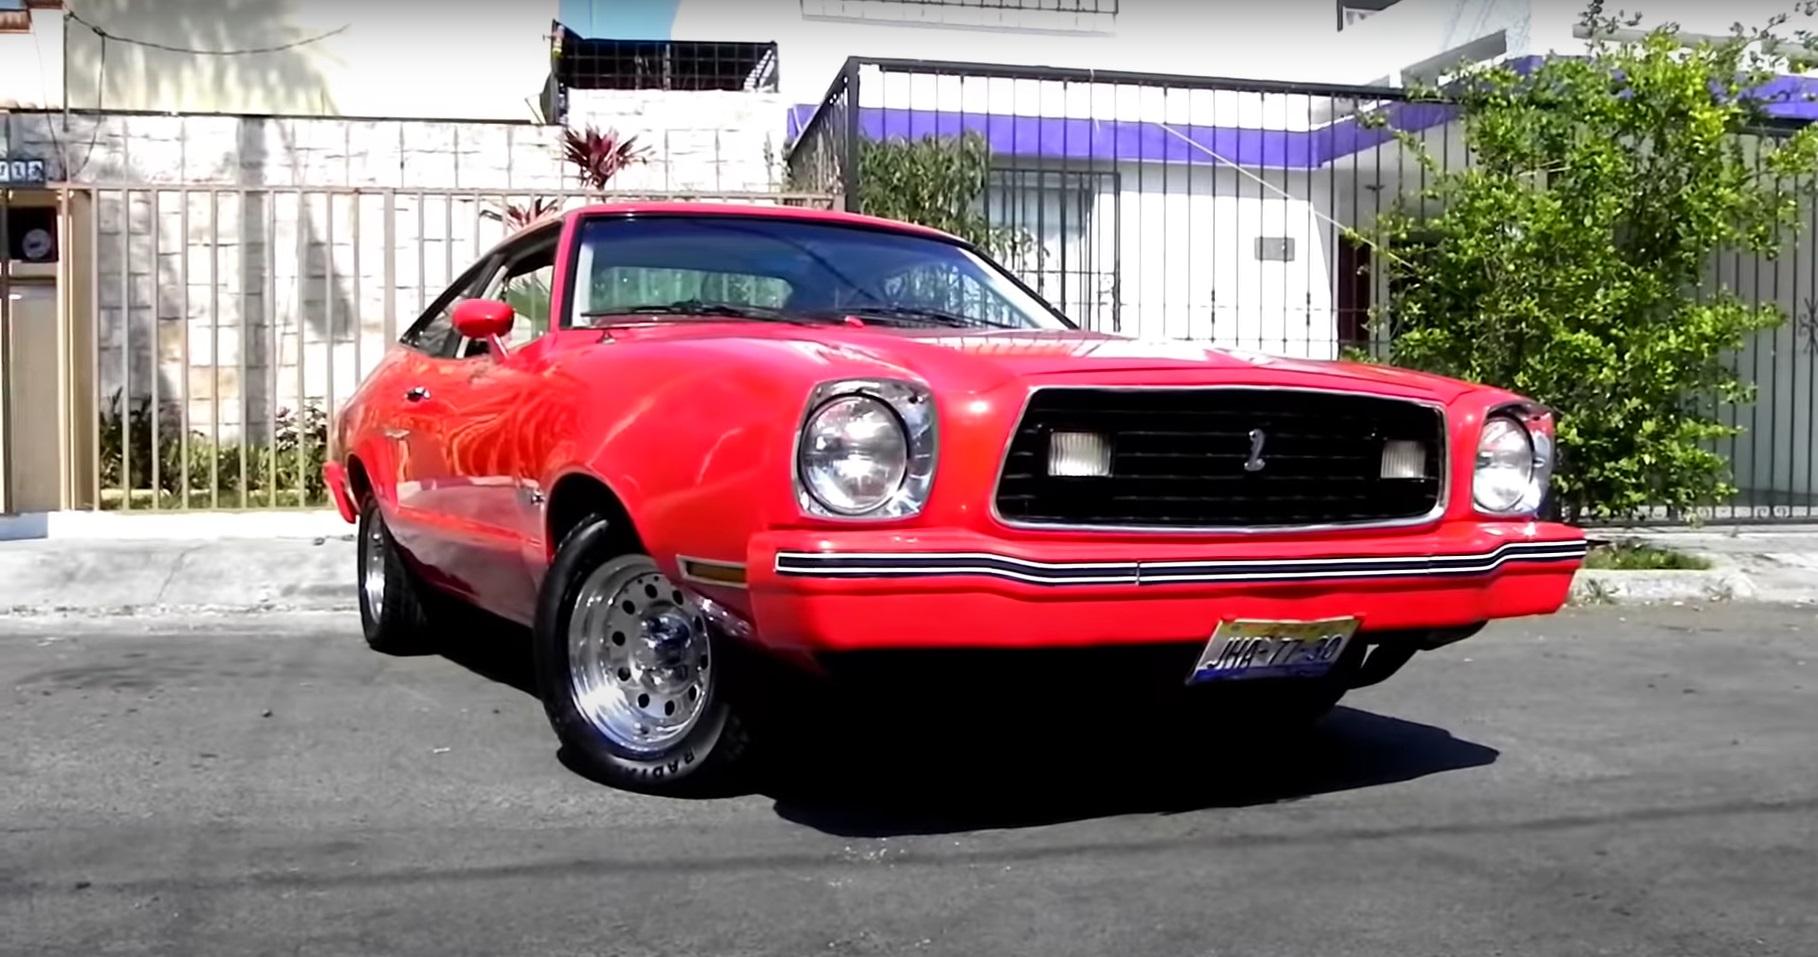 Video: 1977 Ford Mustang II Fastback Walkaround